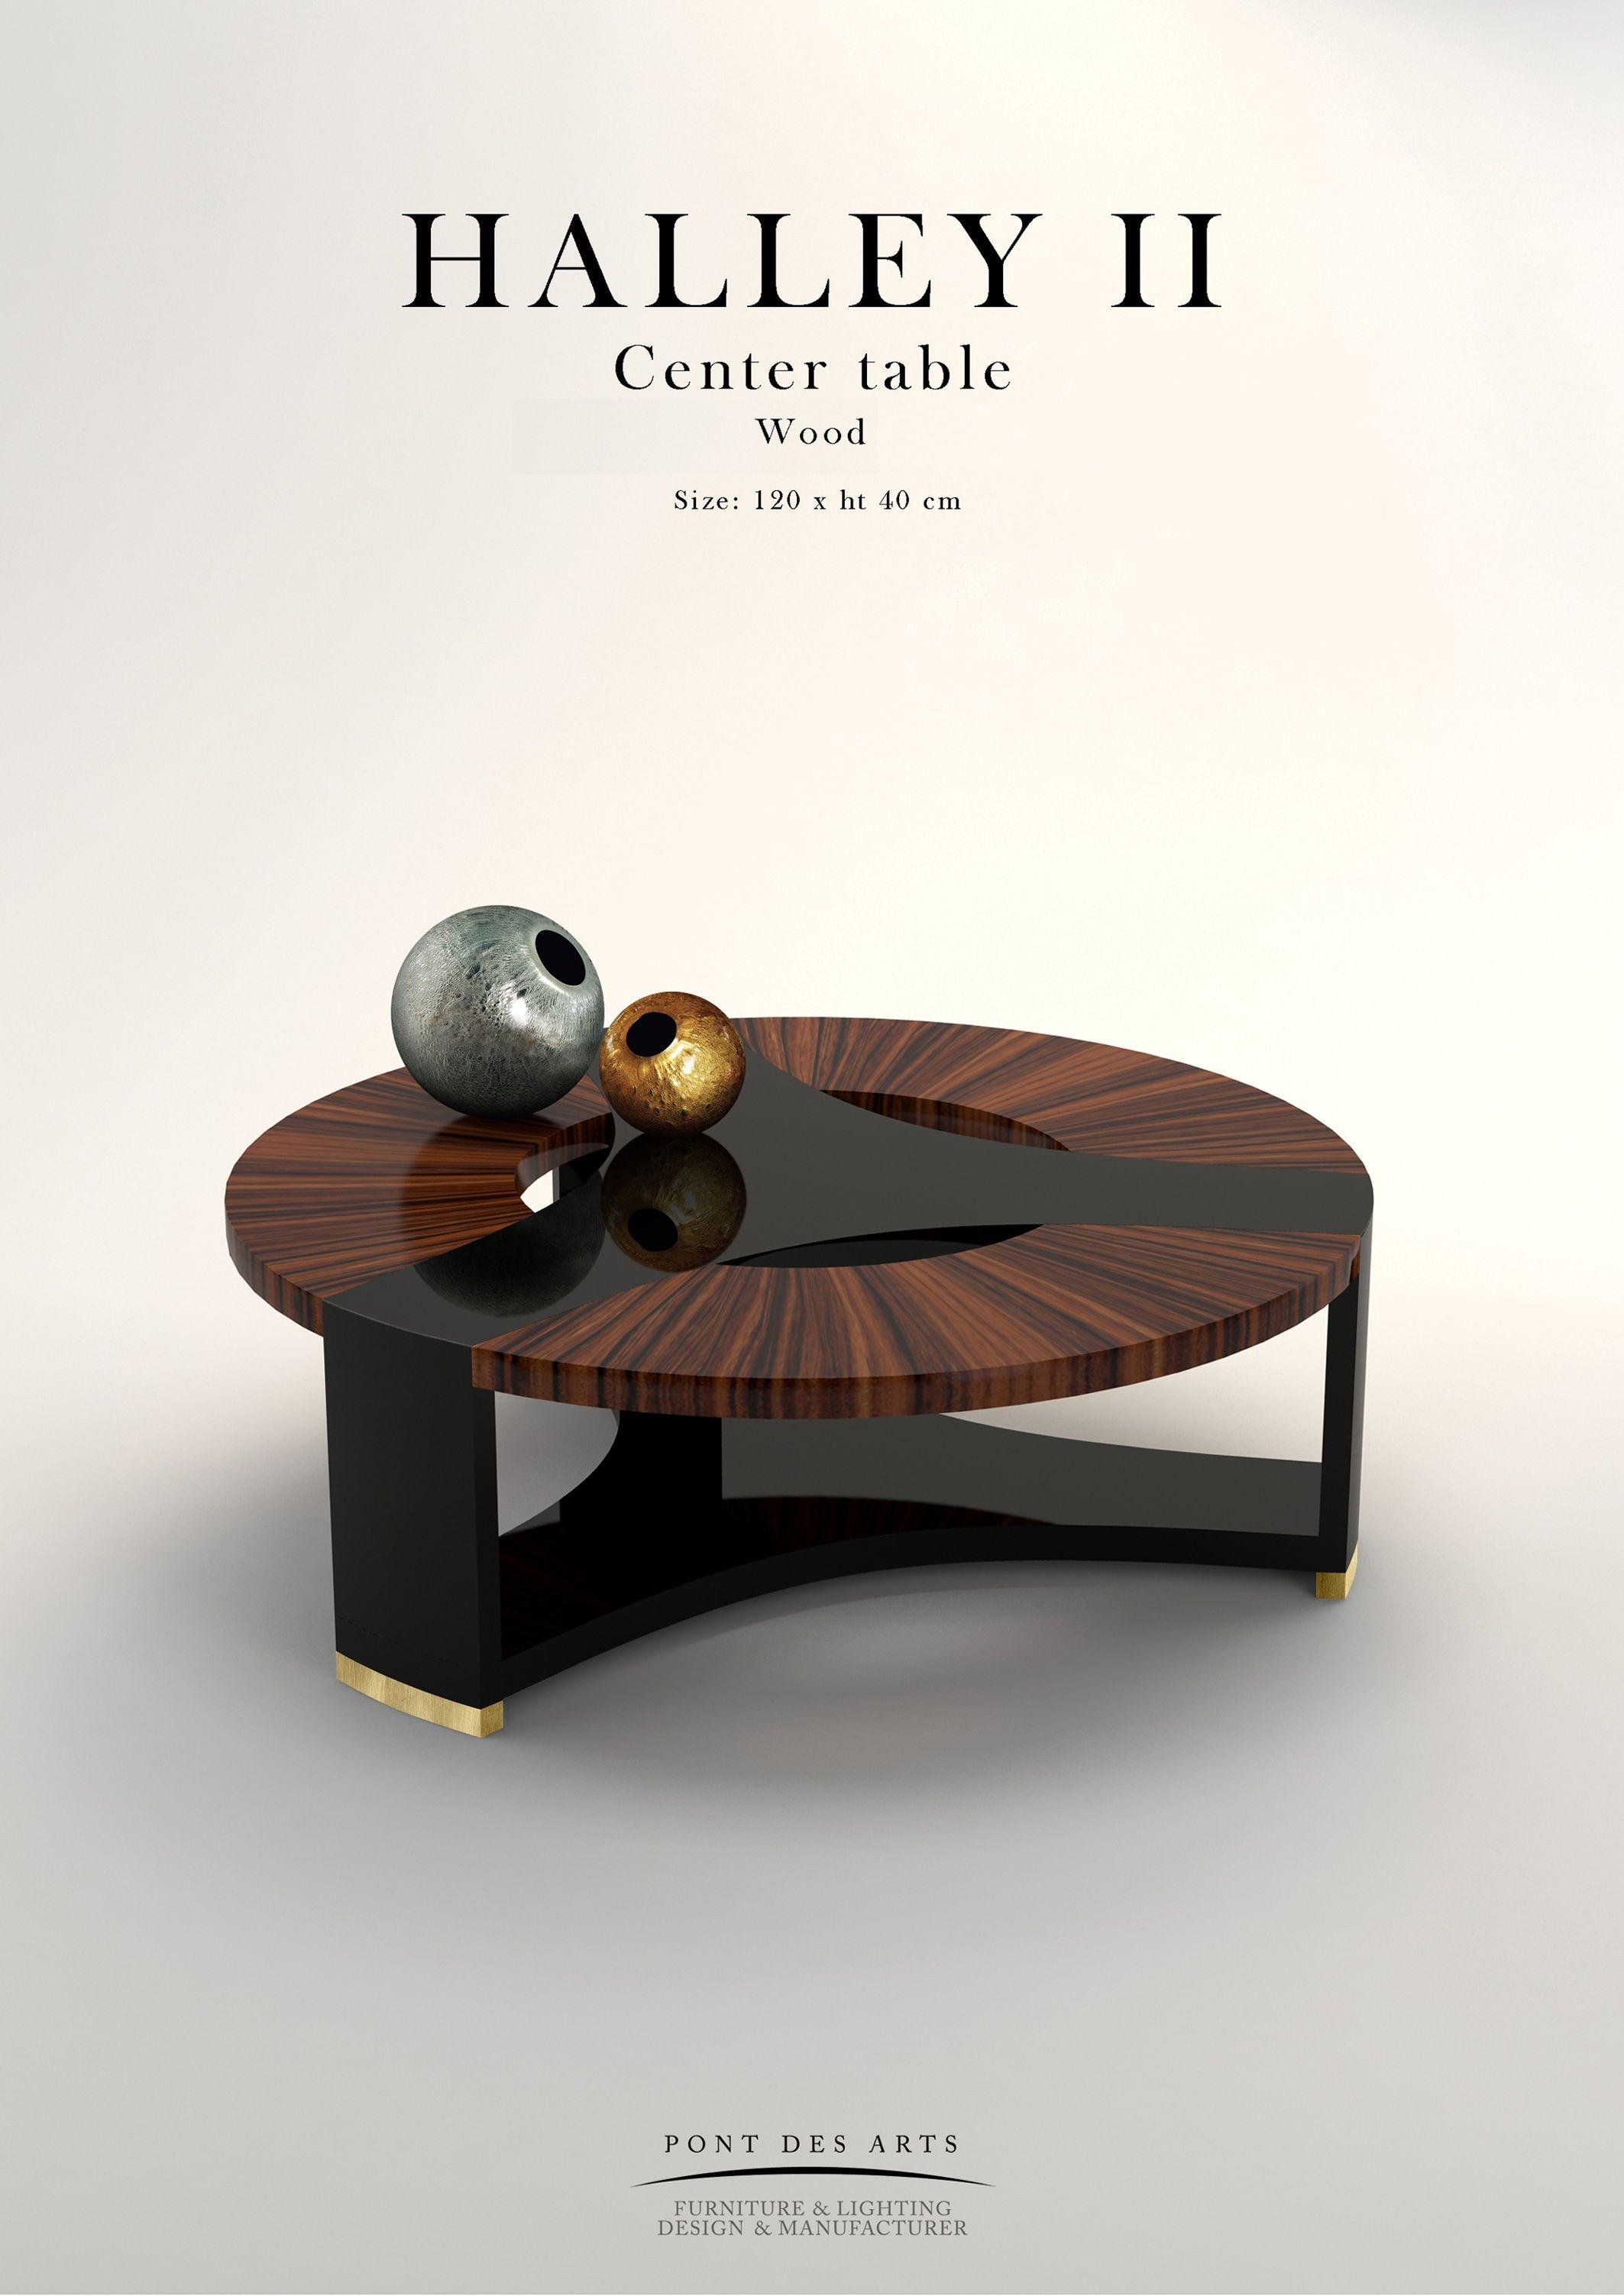 Tea table design furniture - Halley Center Table Pont Des Arts Designer Monzer Hammoud Paris